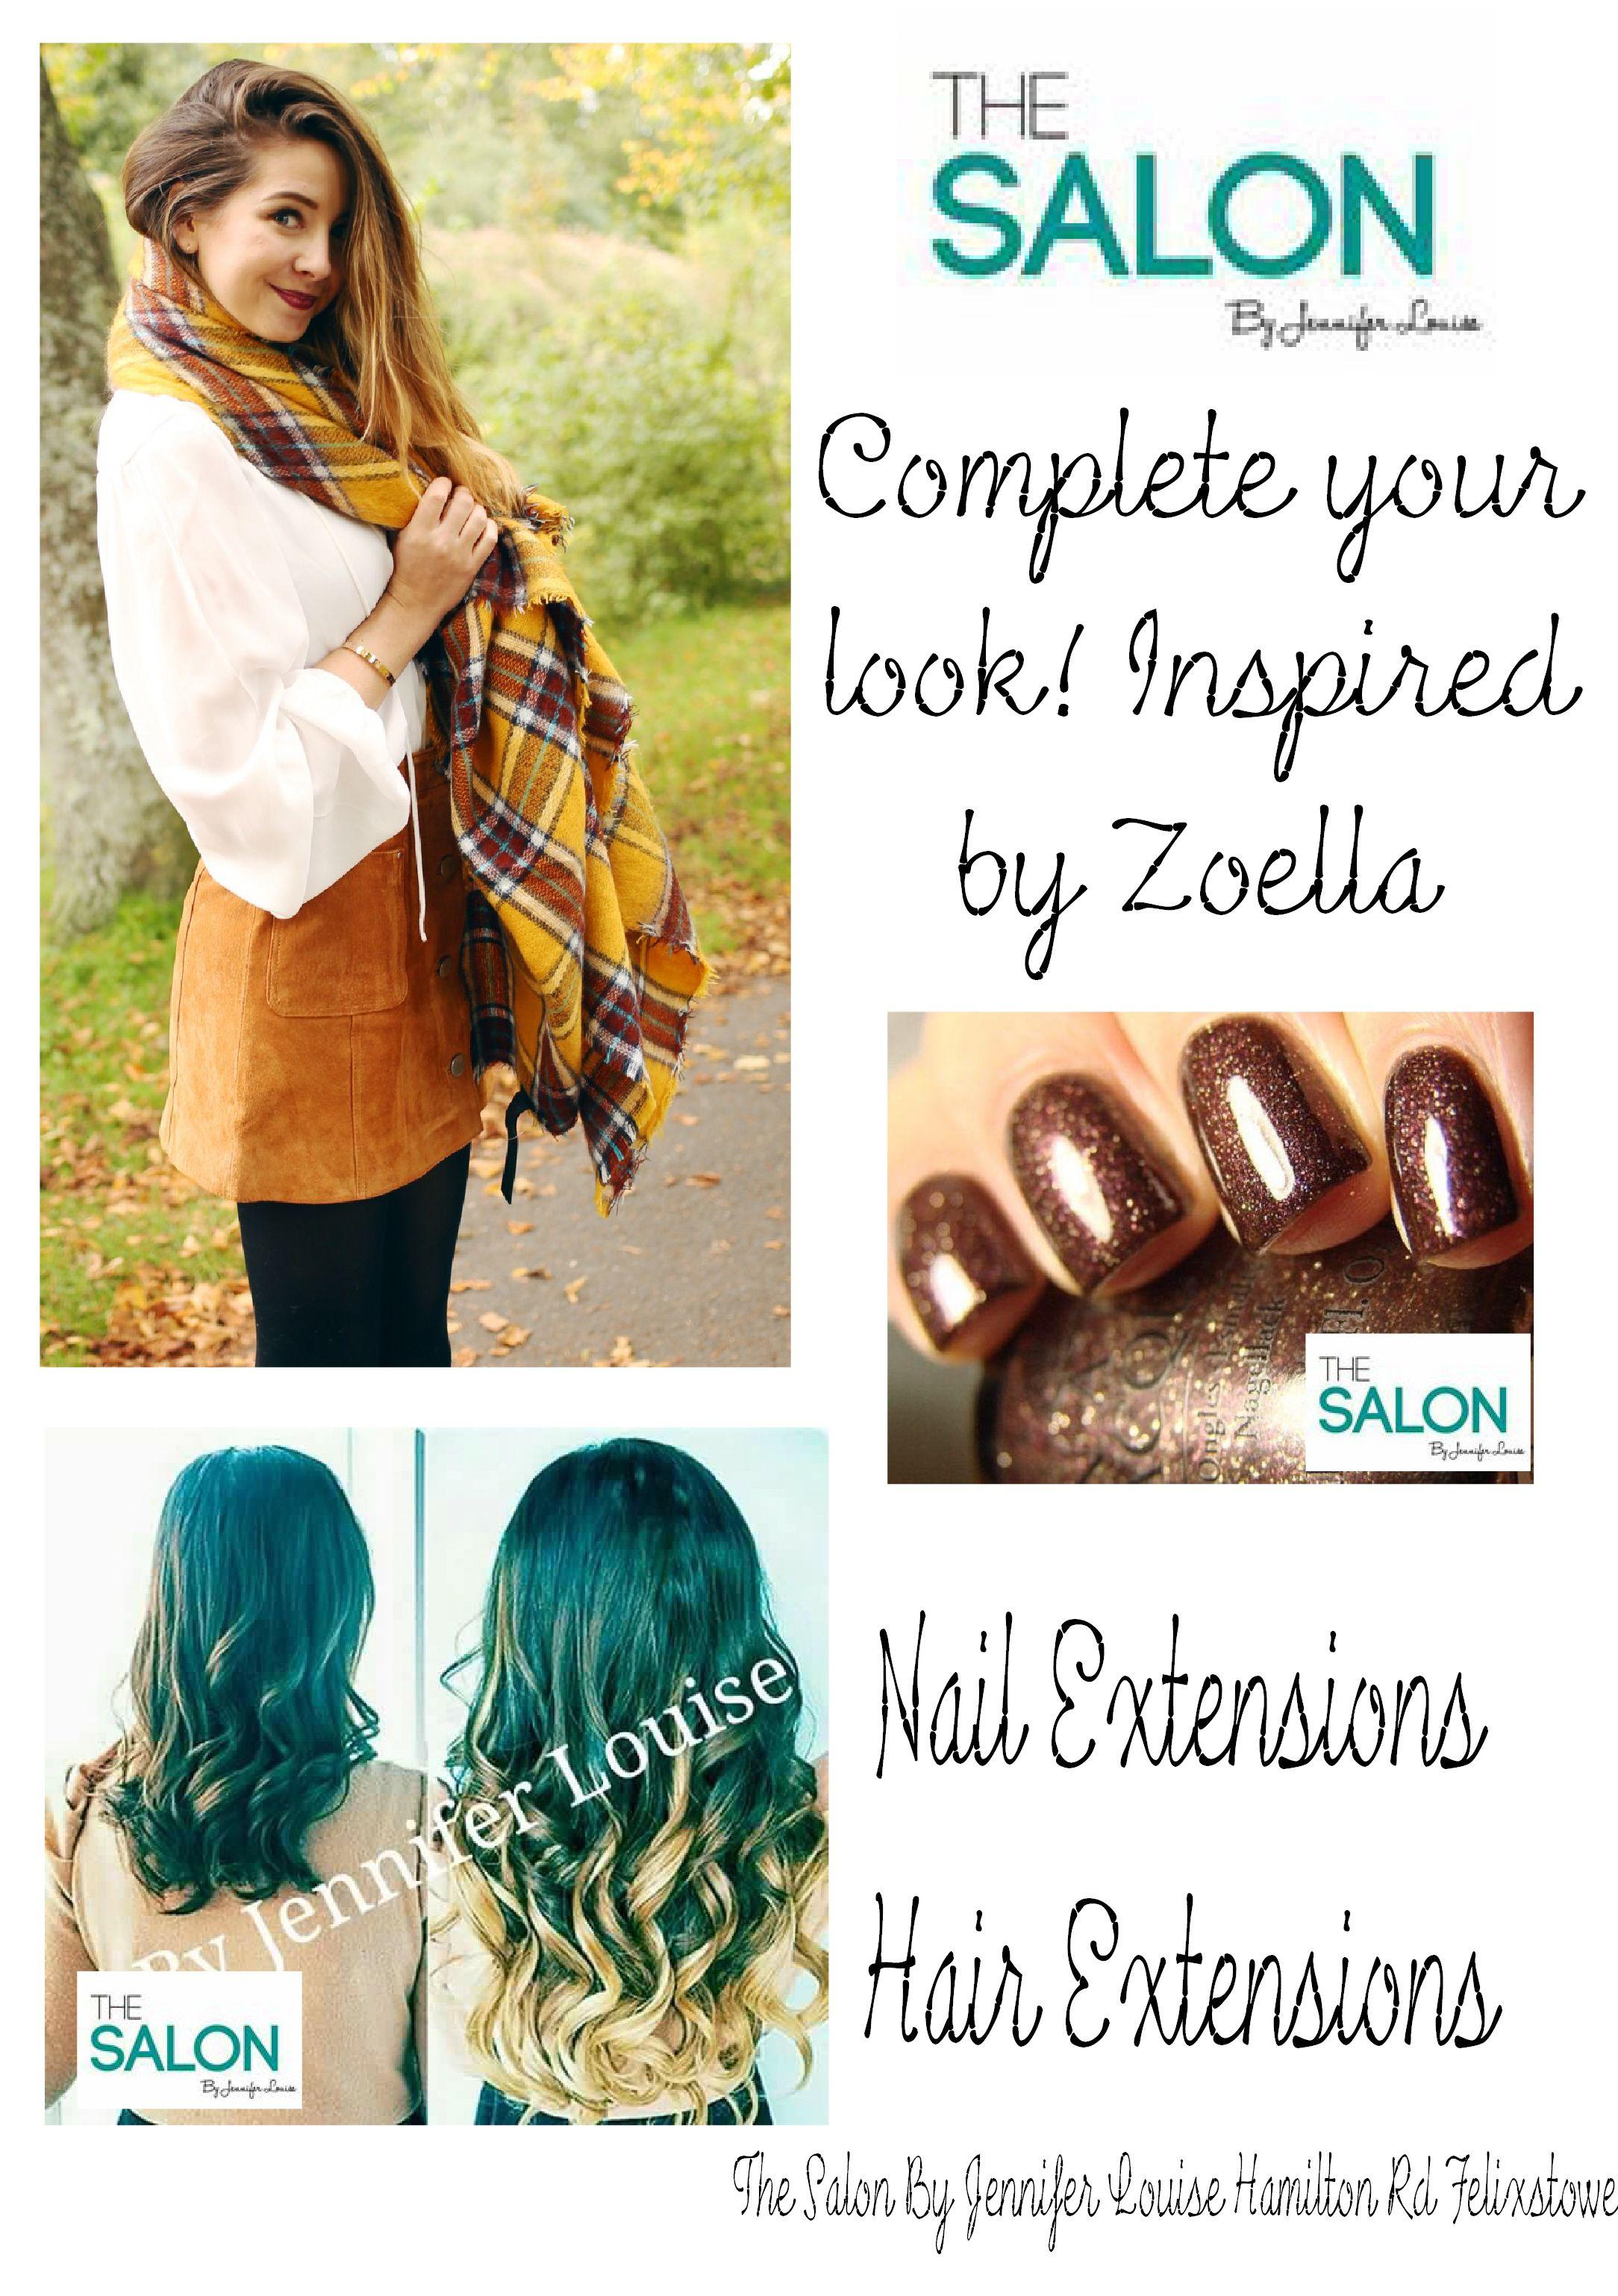 Polish Manicure, Gel Polish, Zoella's Stunning, Zoella Meghan, Merkle Kate,  Meghan